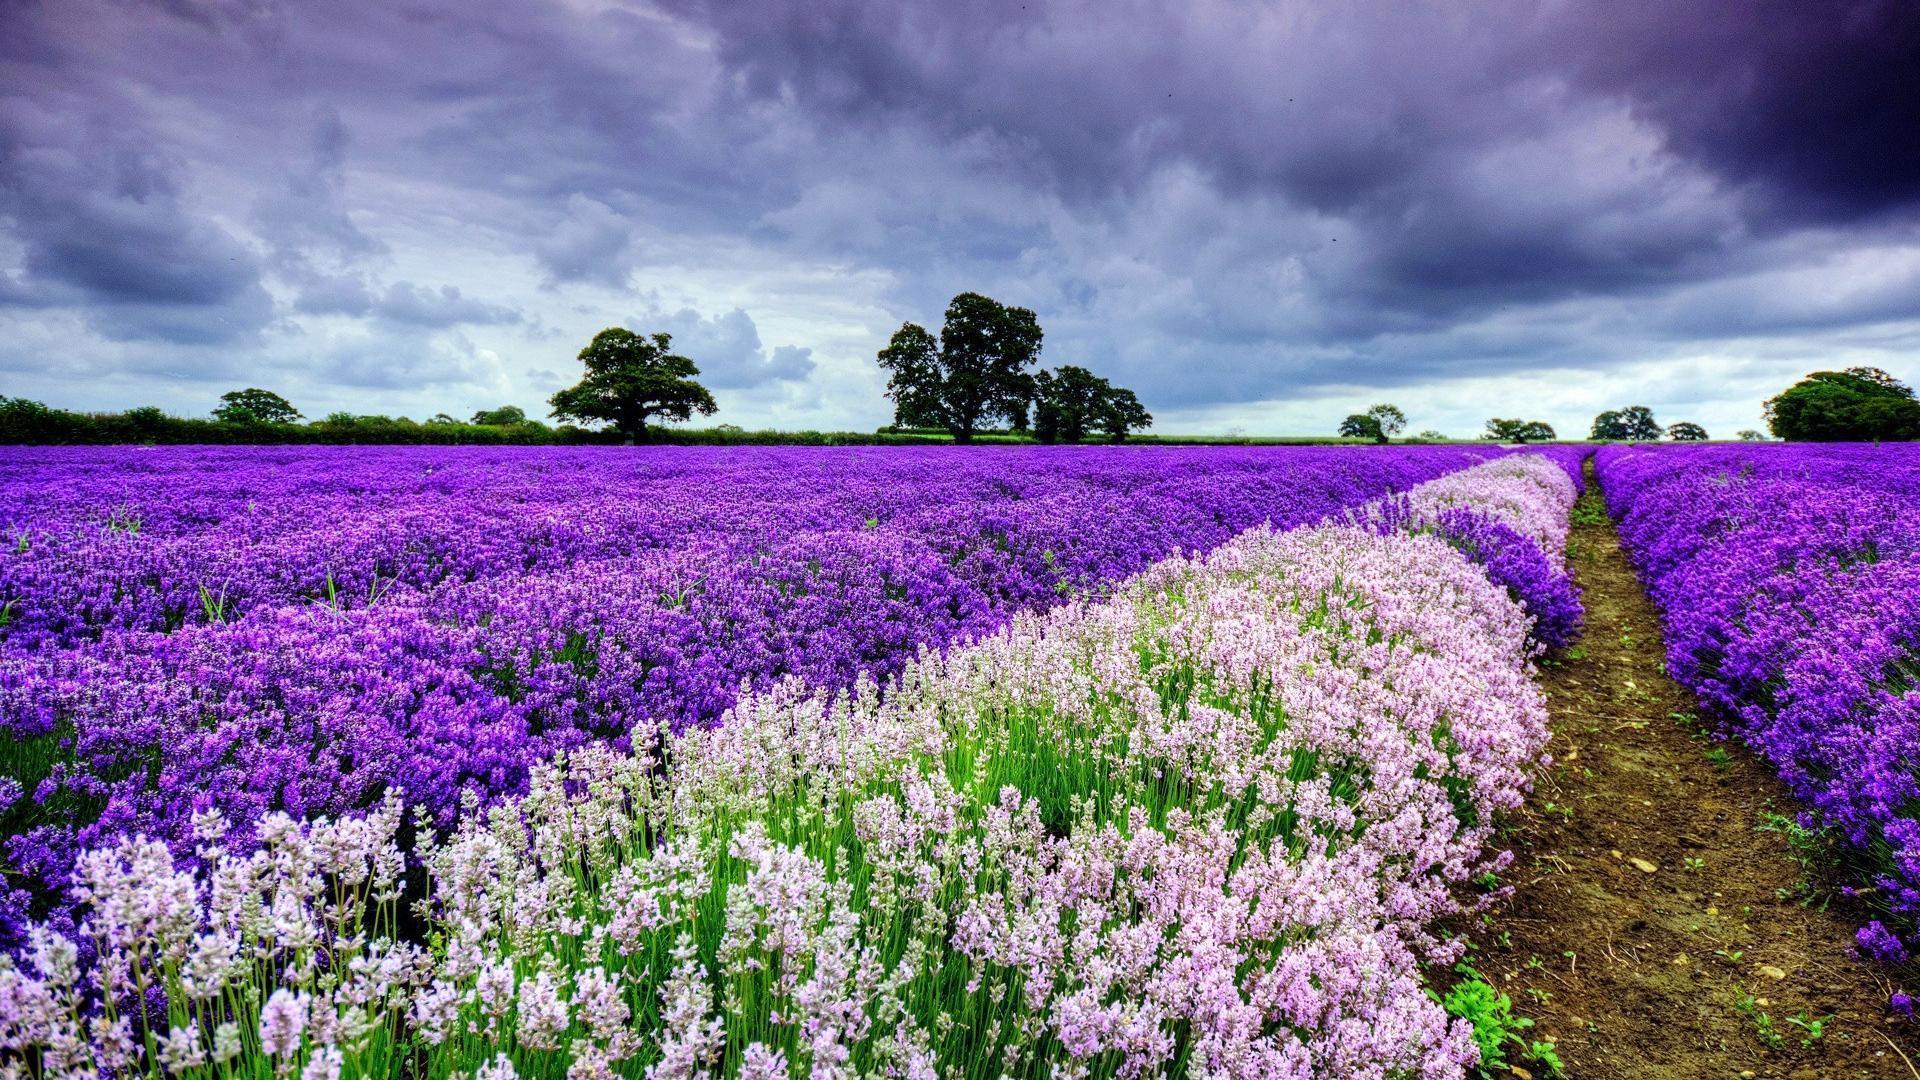 Spring Flowers Widescreen - 4k Ultra Hd Nature , HD Wallpaper & Backgrounds